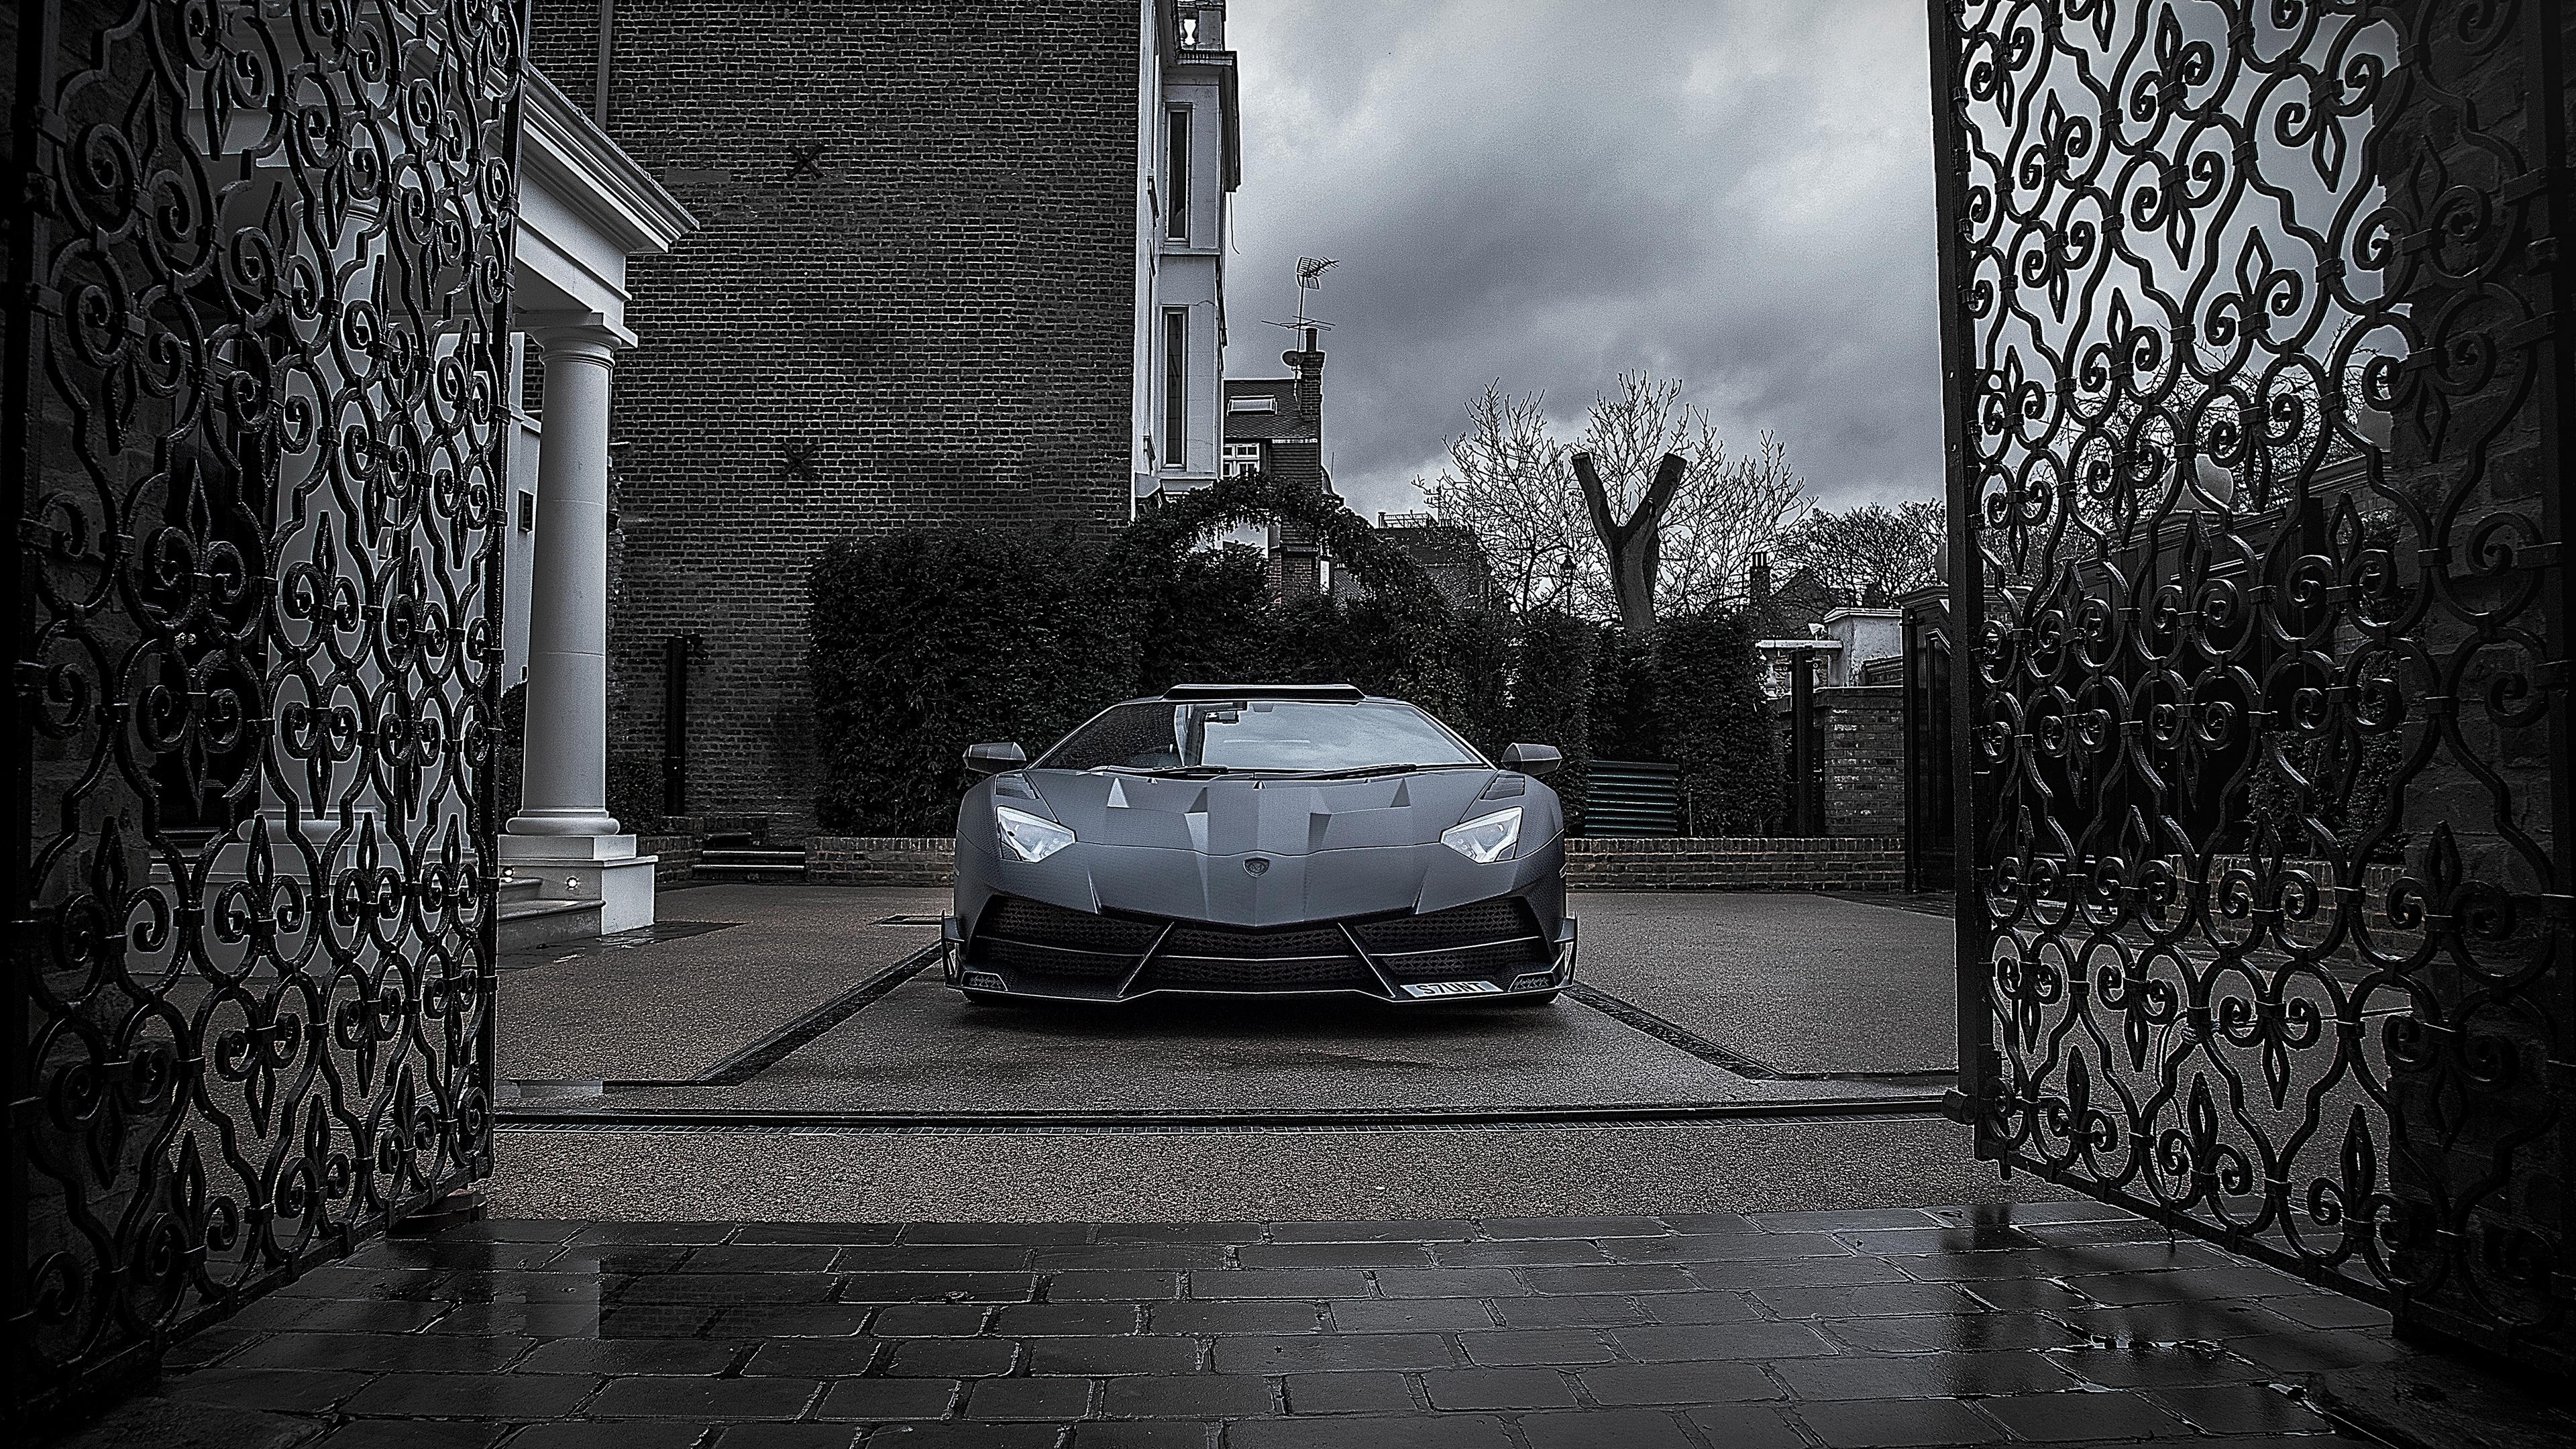 Wallpaper 4k Mansory Lamborghini Aventador Black Gate